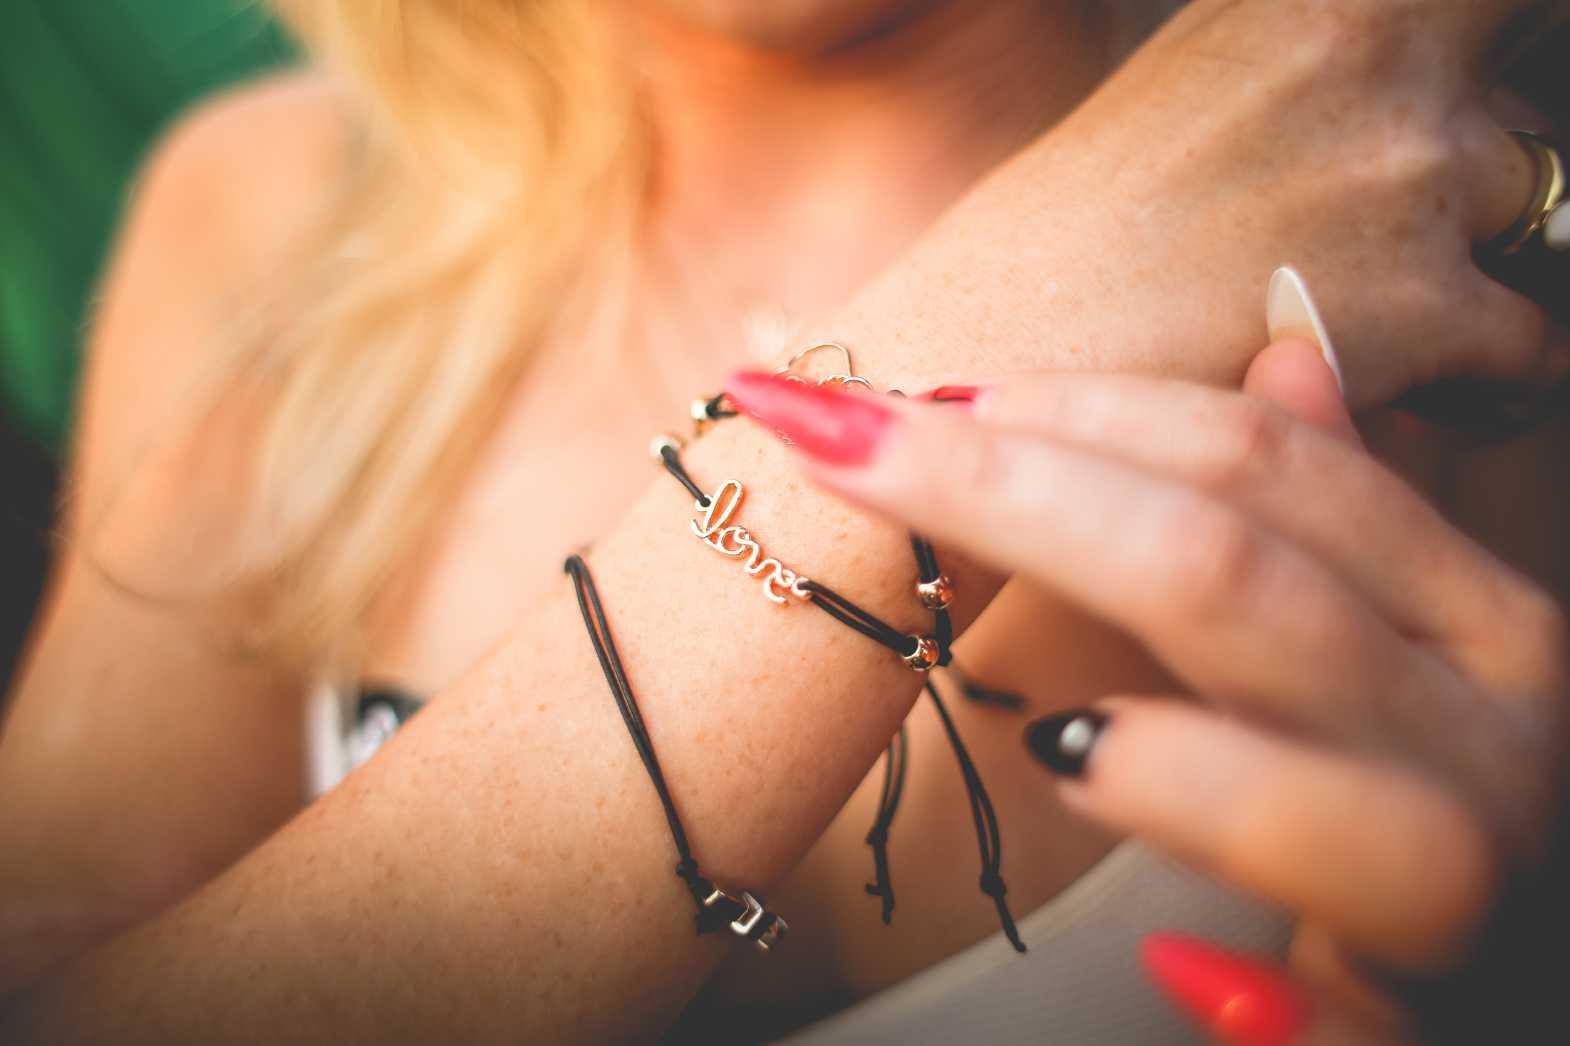 Free stock photo of Love Bracelet from picjumbo.com